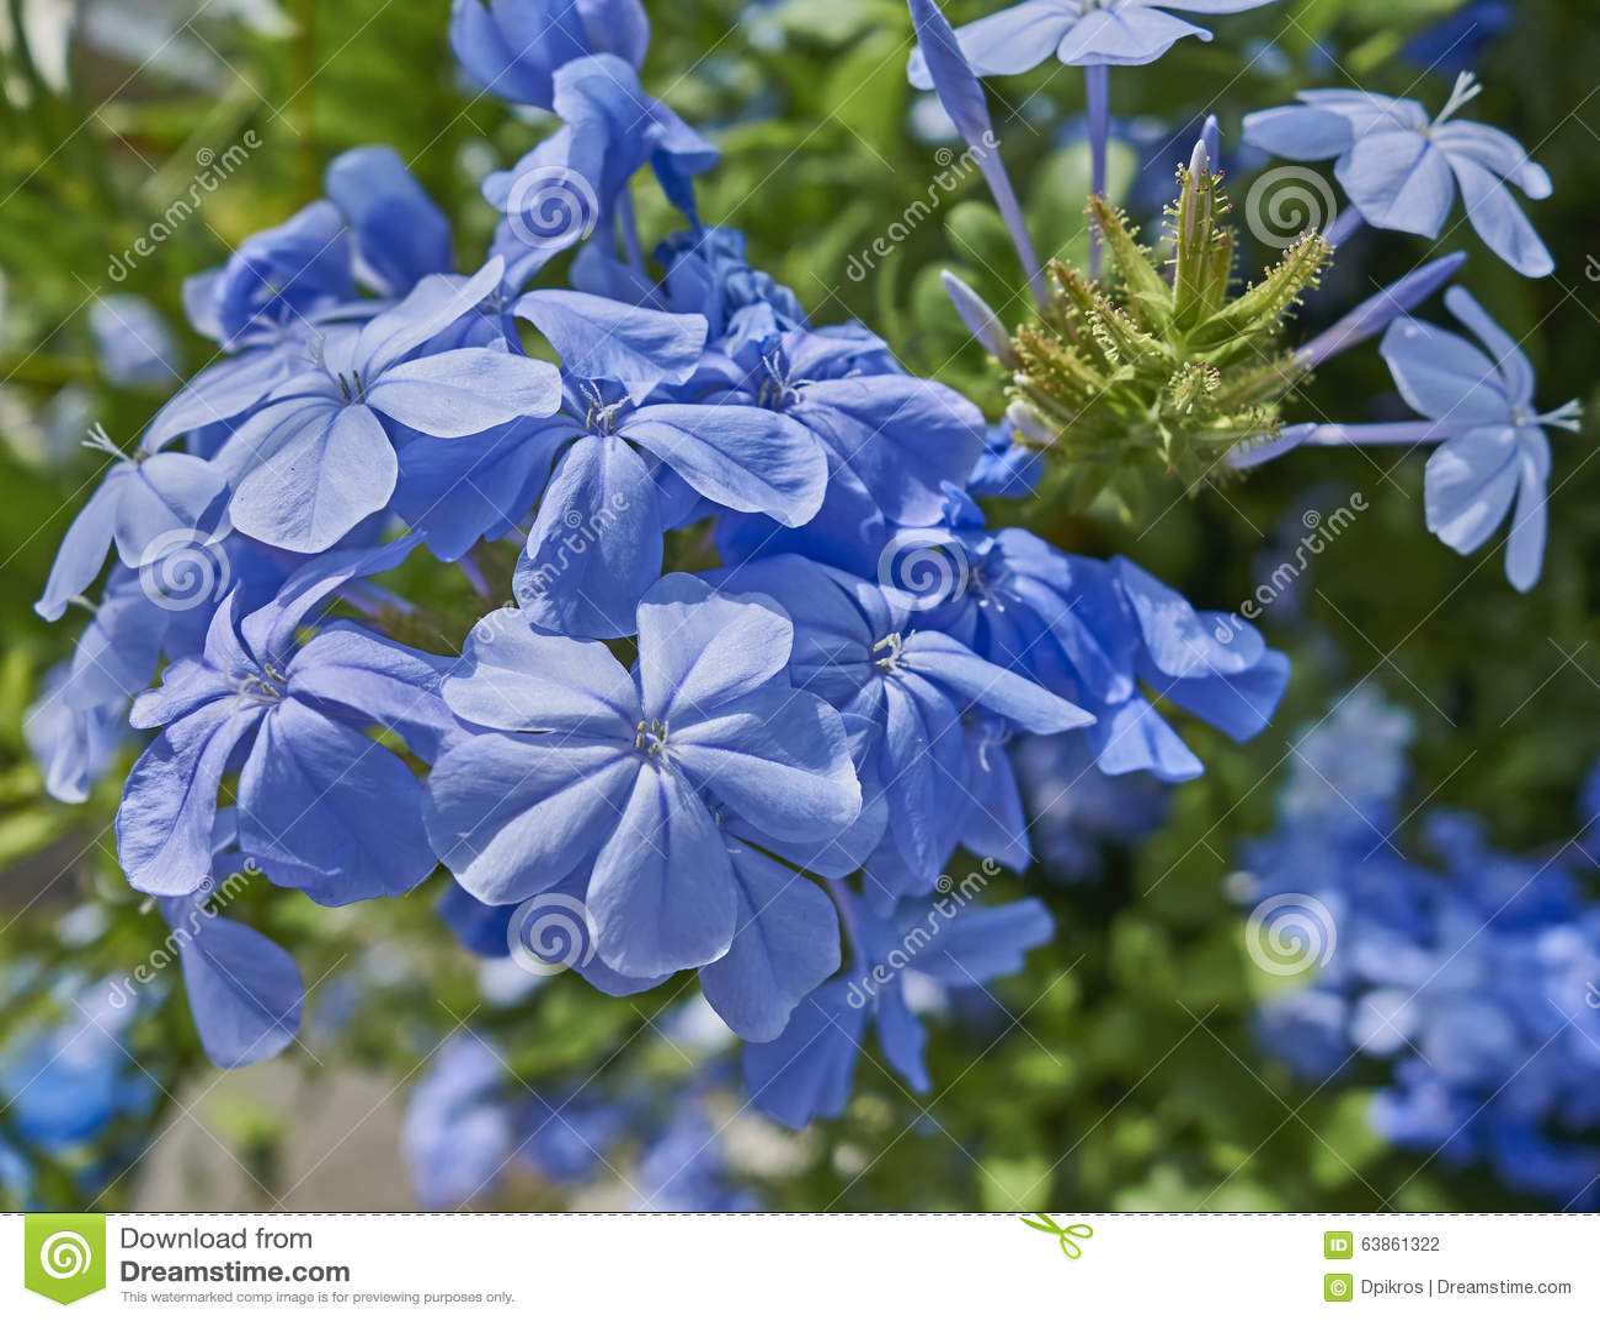 Blue jasmine flowers natural bouquet stock photo image of bush blue jasmine flowers natural bouquet izmirmasajfo